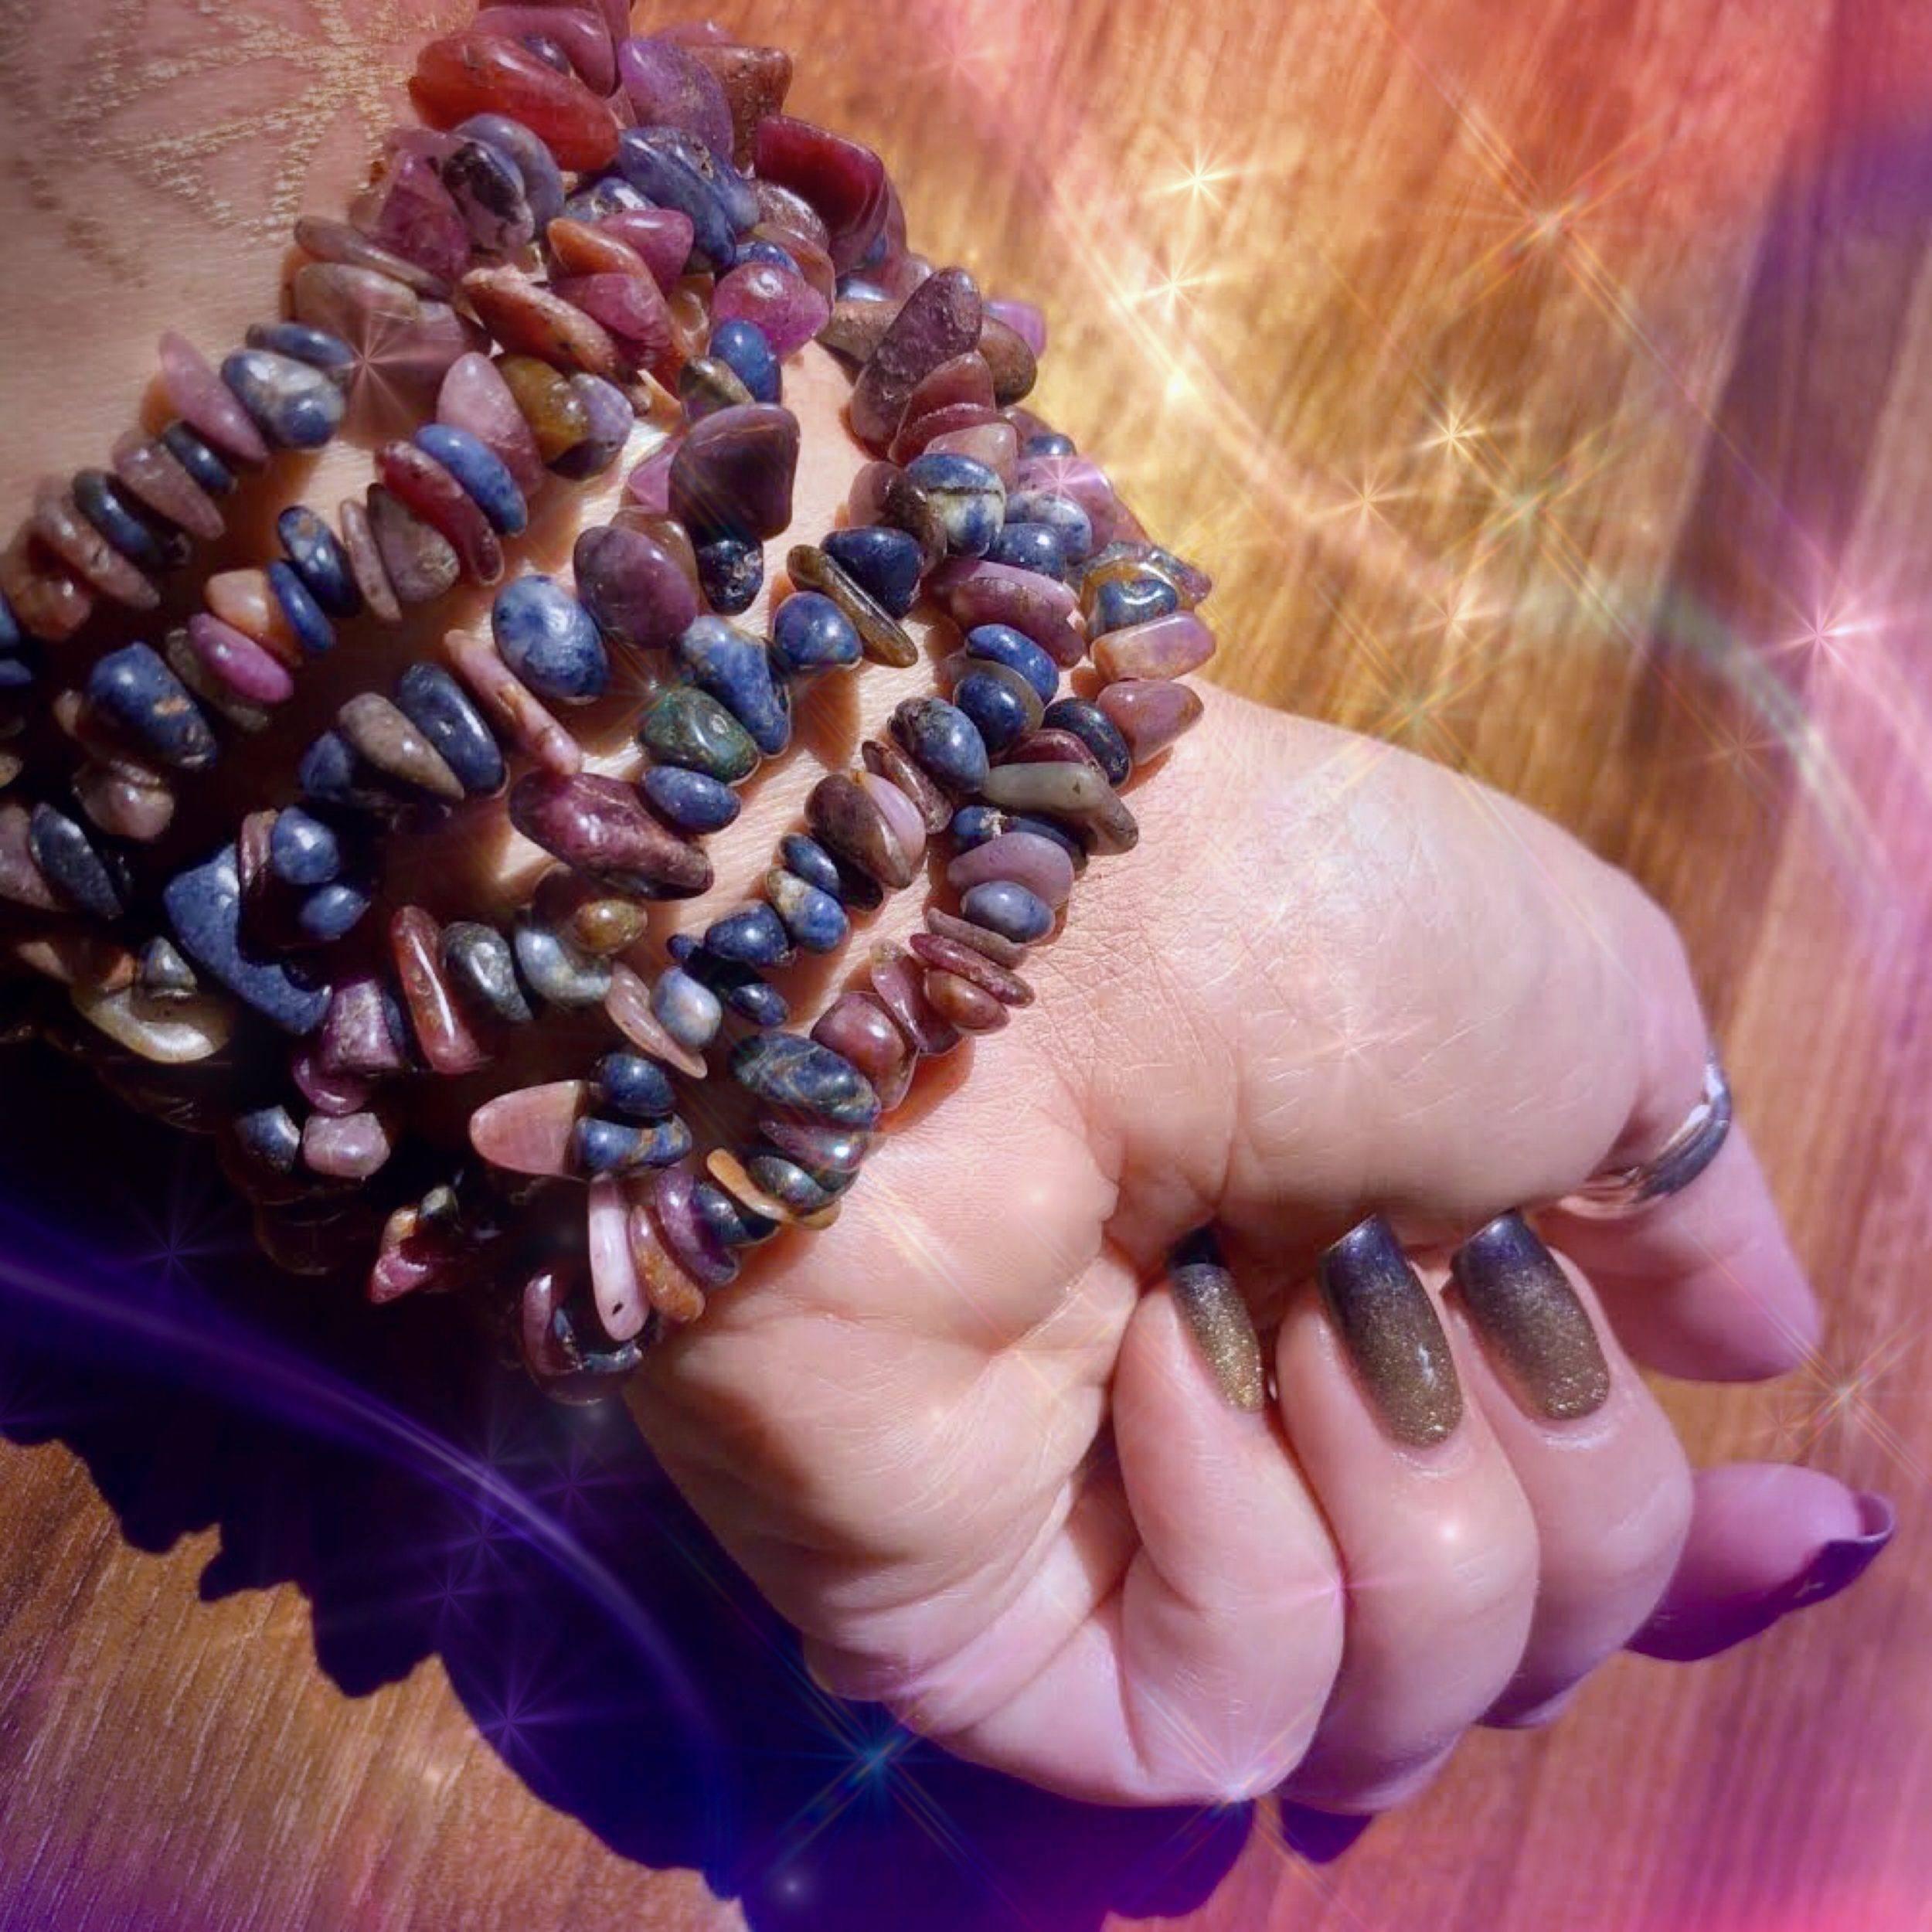 Ruby_and_sapphire_Denver_after_dark_bracelets_2of2_9_12